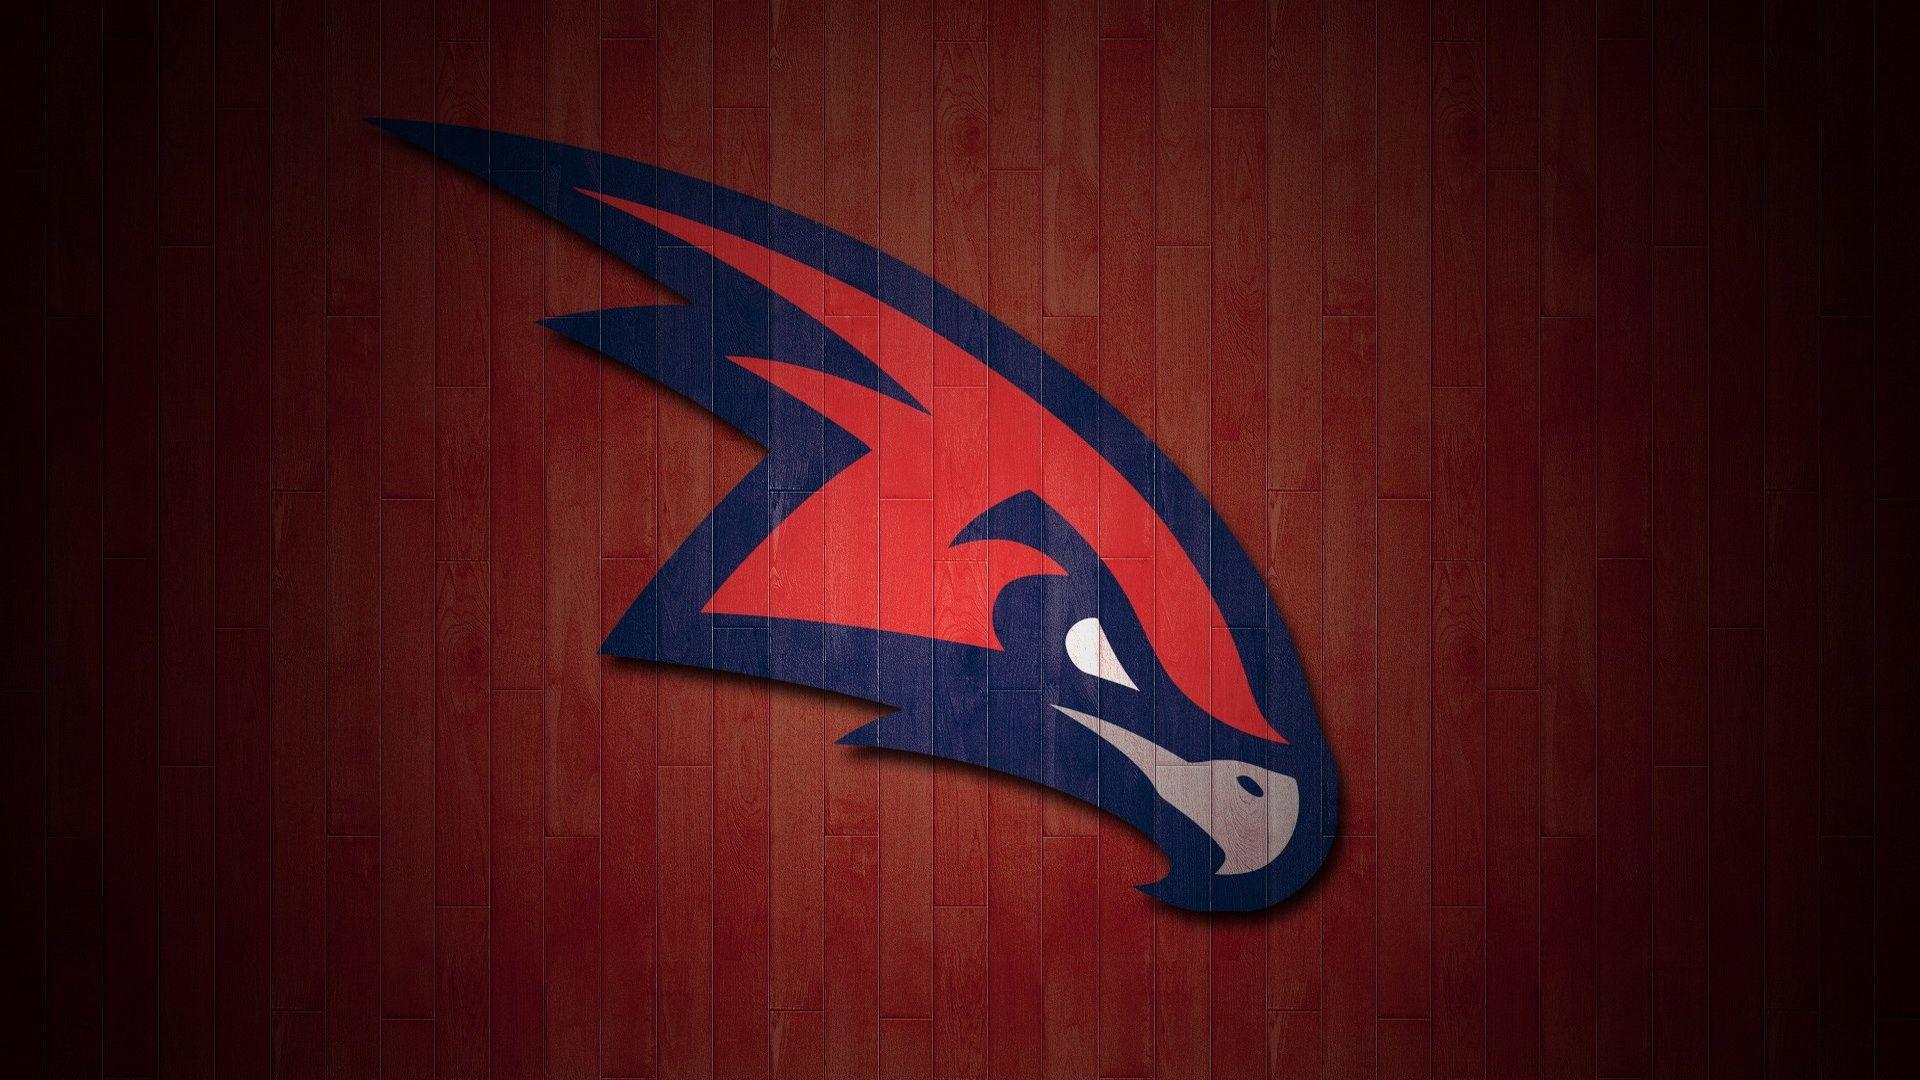 NBA Atlanta Hawks Logo Team Wallpaper HD 2016 In Basketball